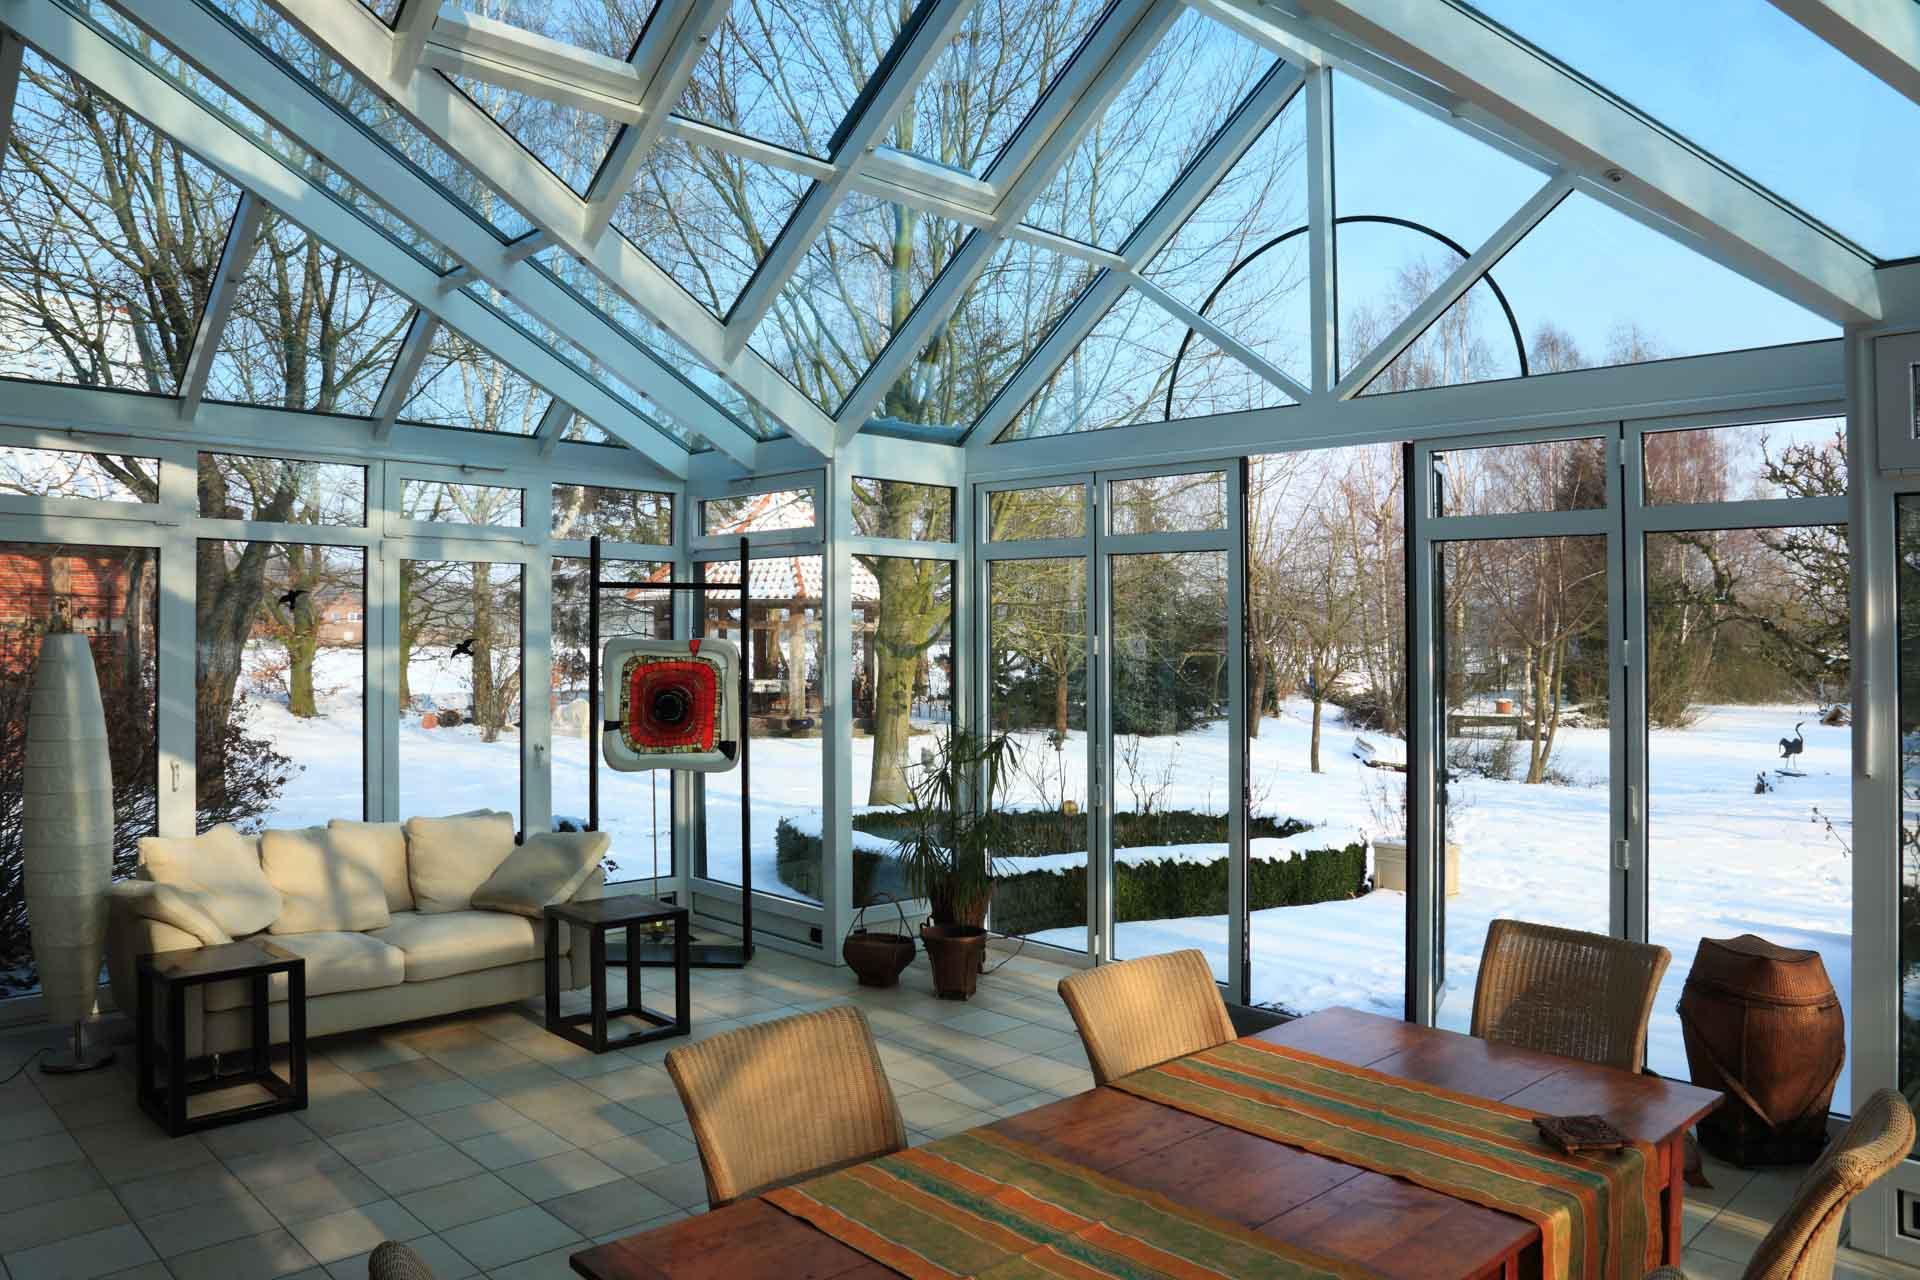 DecoArt Wintergarten in Nortrup (Objekt 827). Wintergarten 827_5289 im Winter